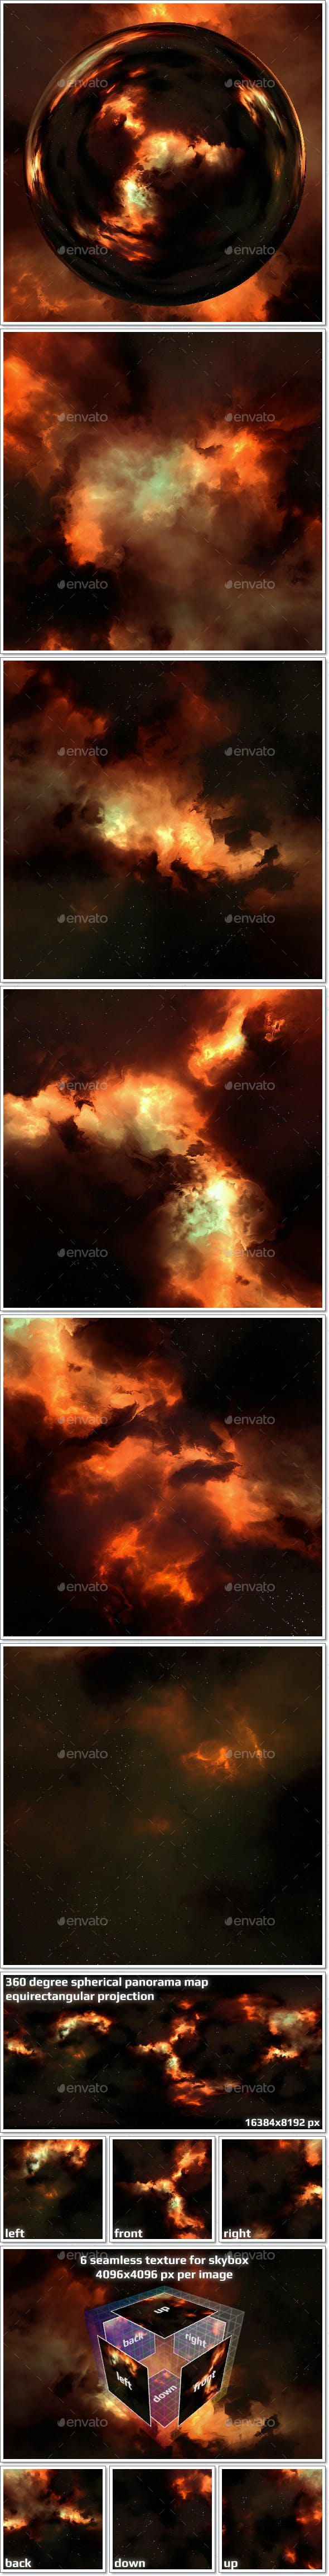 Nebula Space Environment HDRI Map 019 - 3DOcean Item for Sale